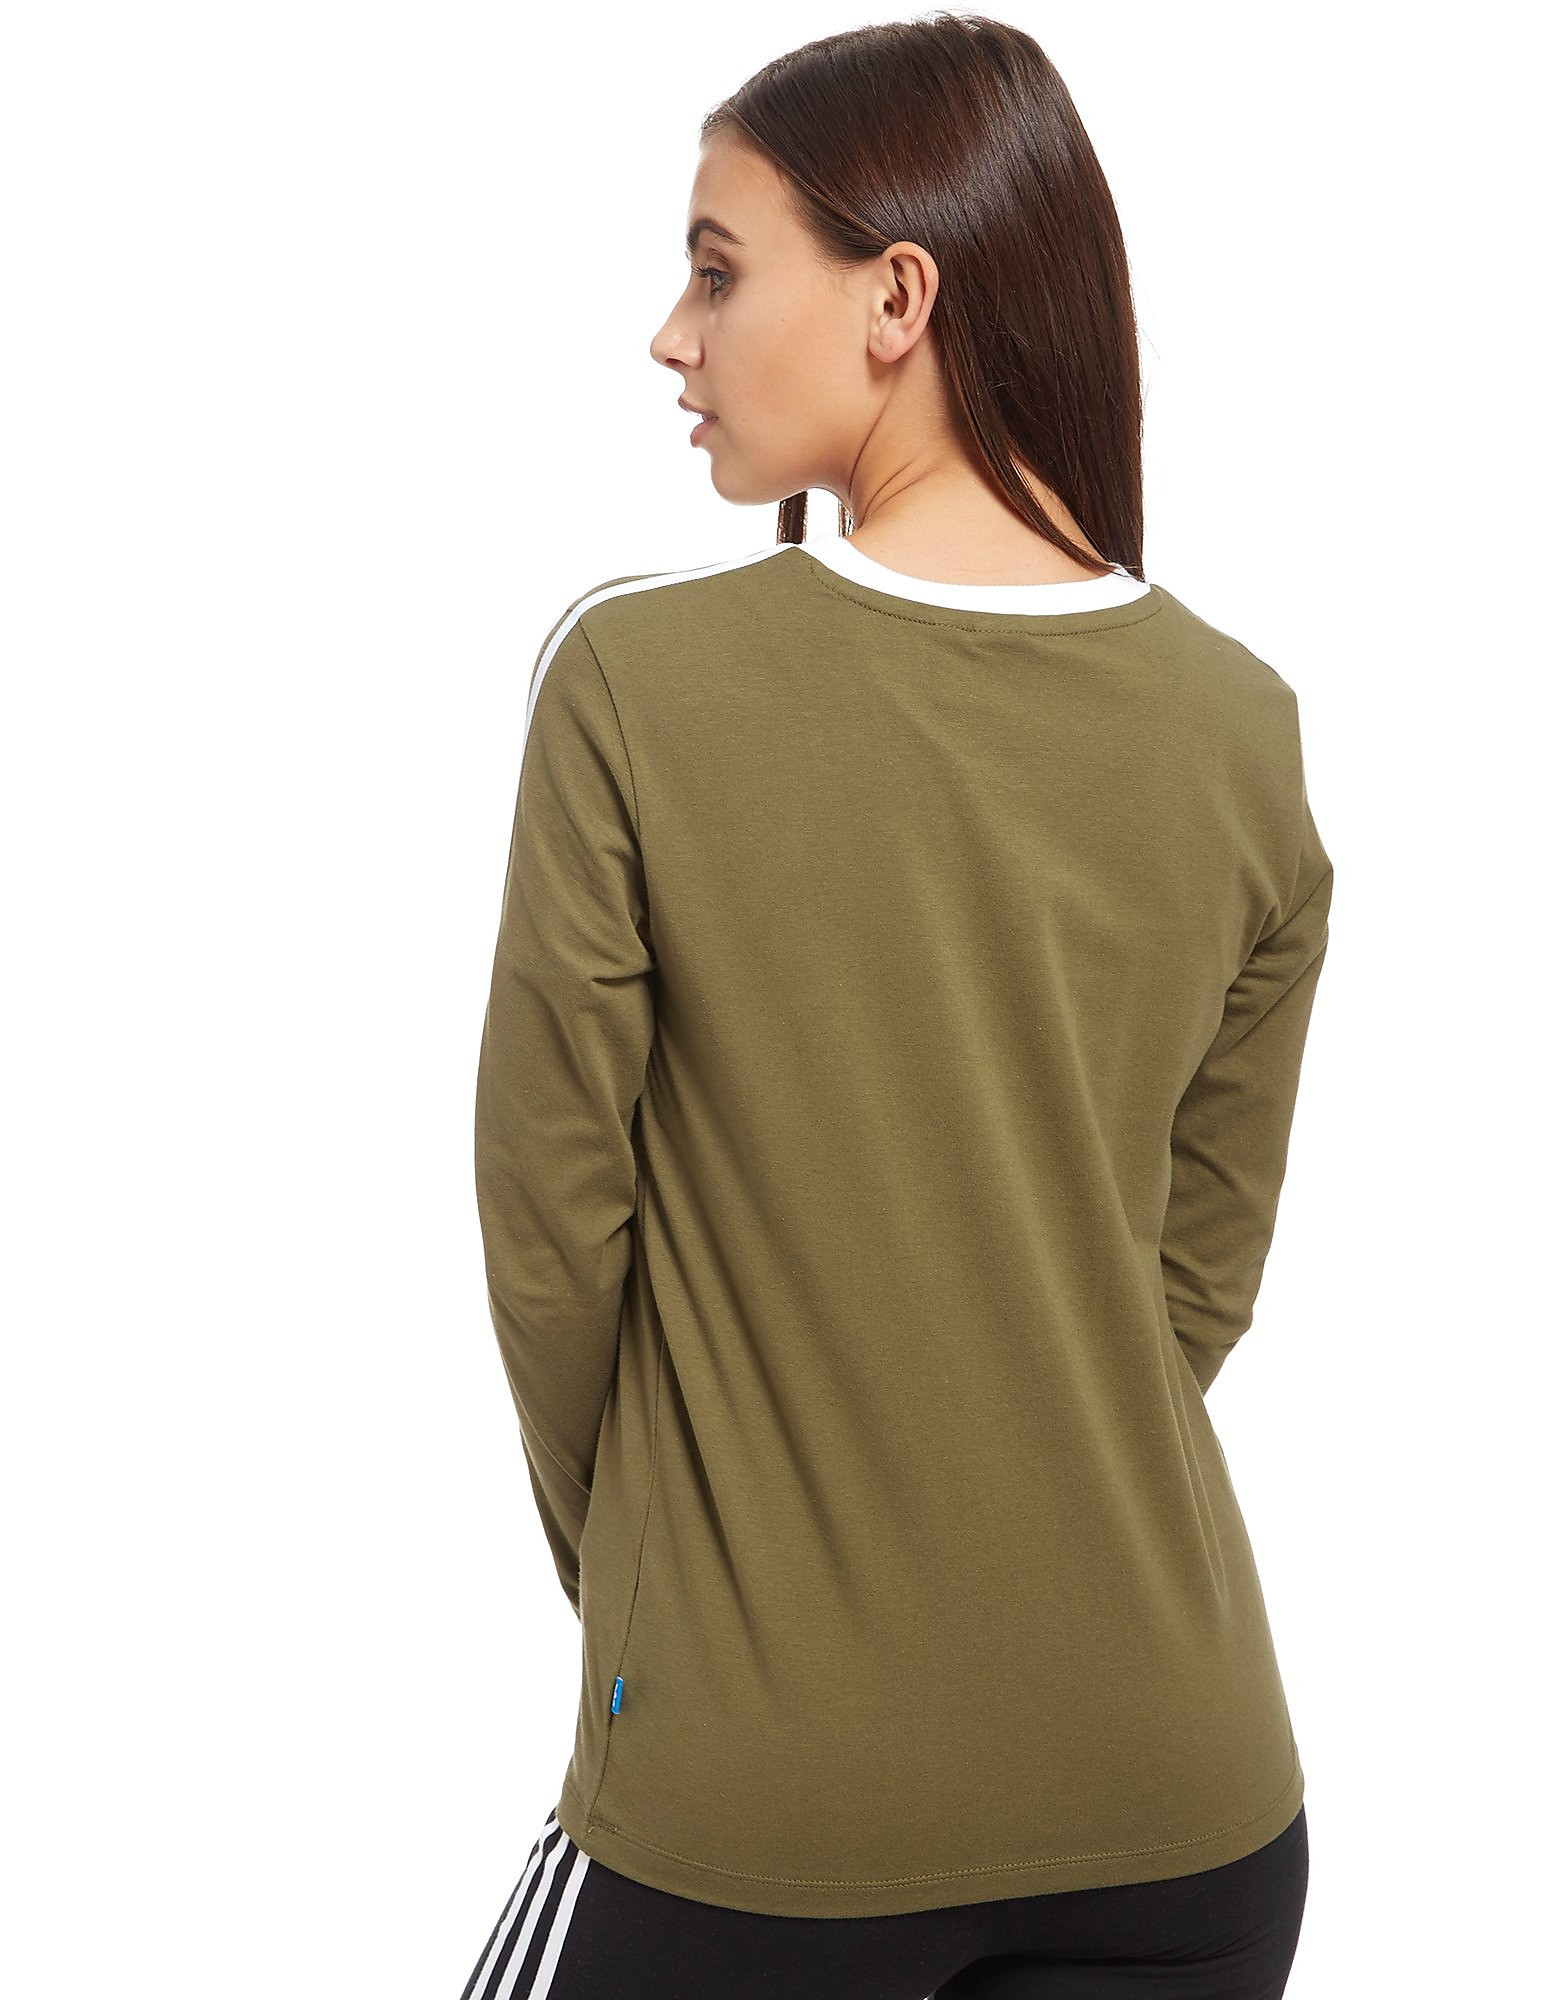 adidas Originals Long Sleeve California T-Shirt